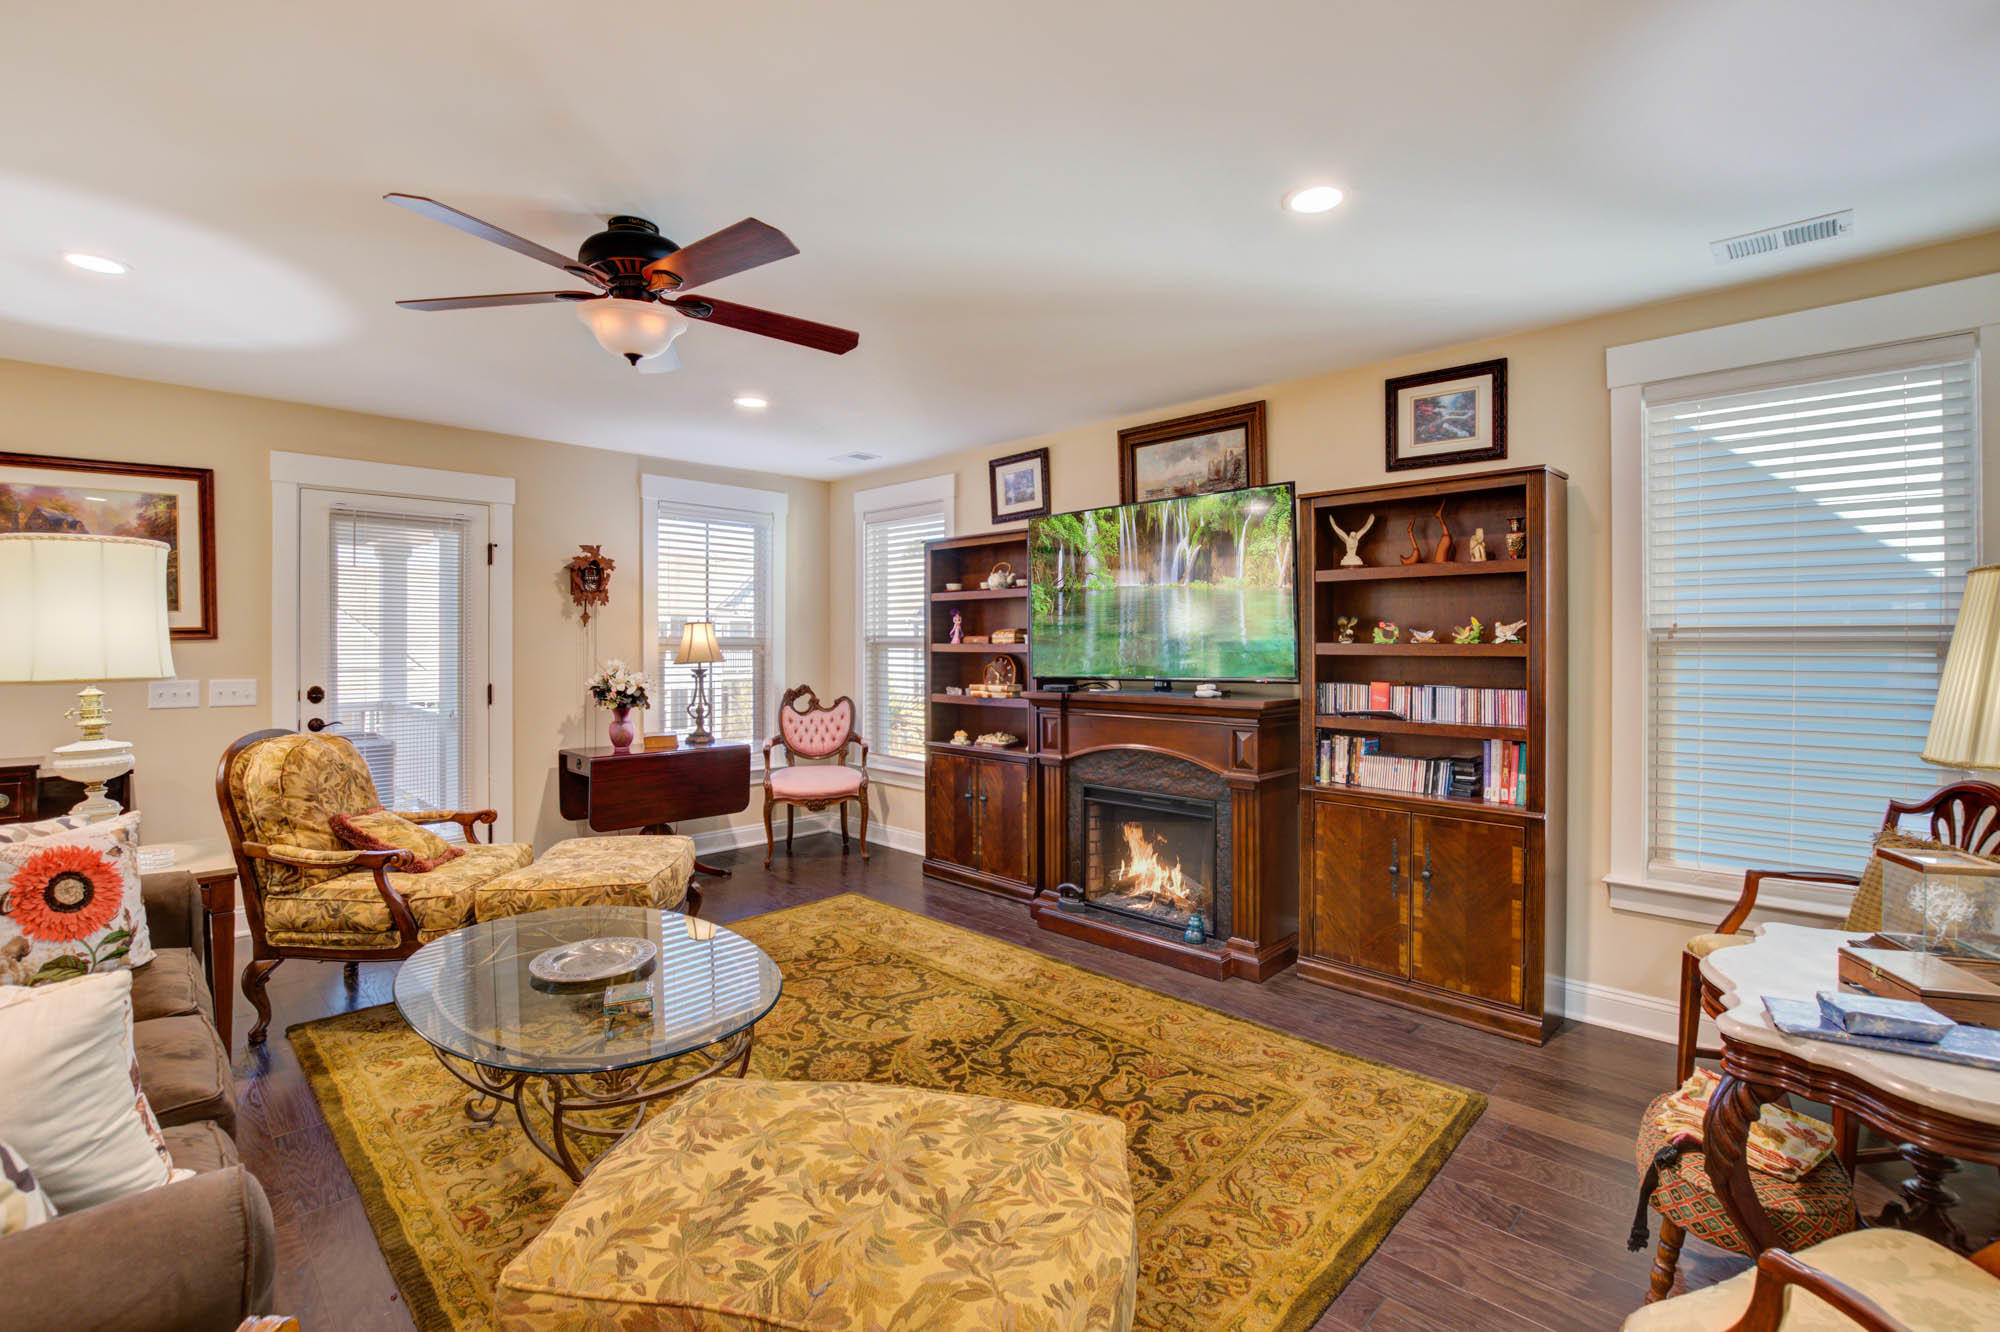 Carolina Bay Homes For Sale - 1850 Grovehurst, Charleston, SC - 15